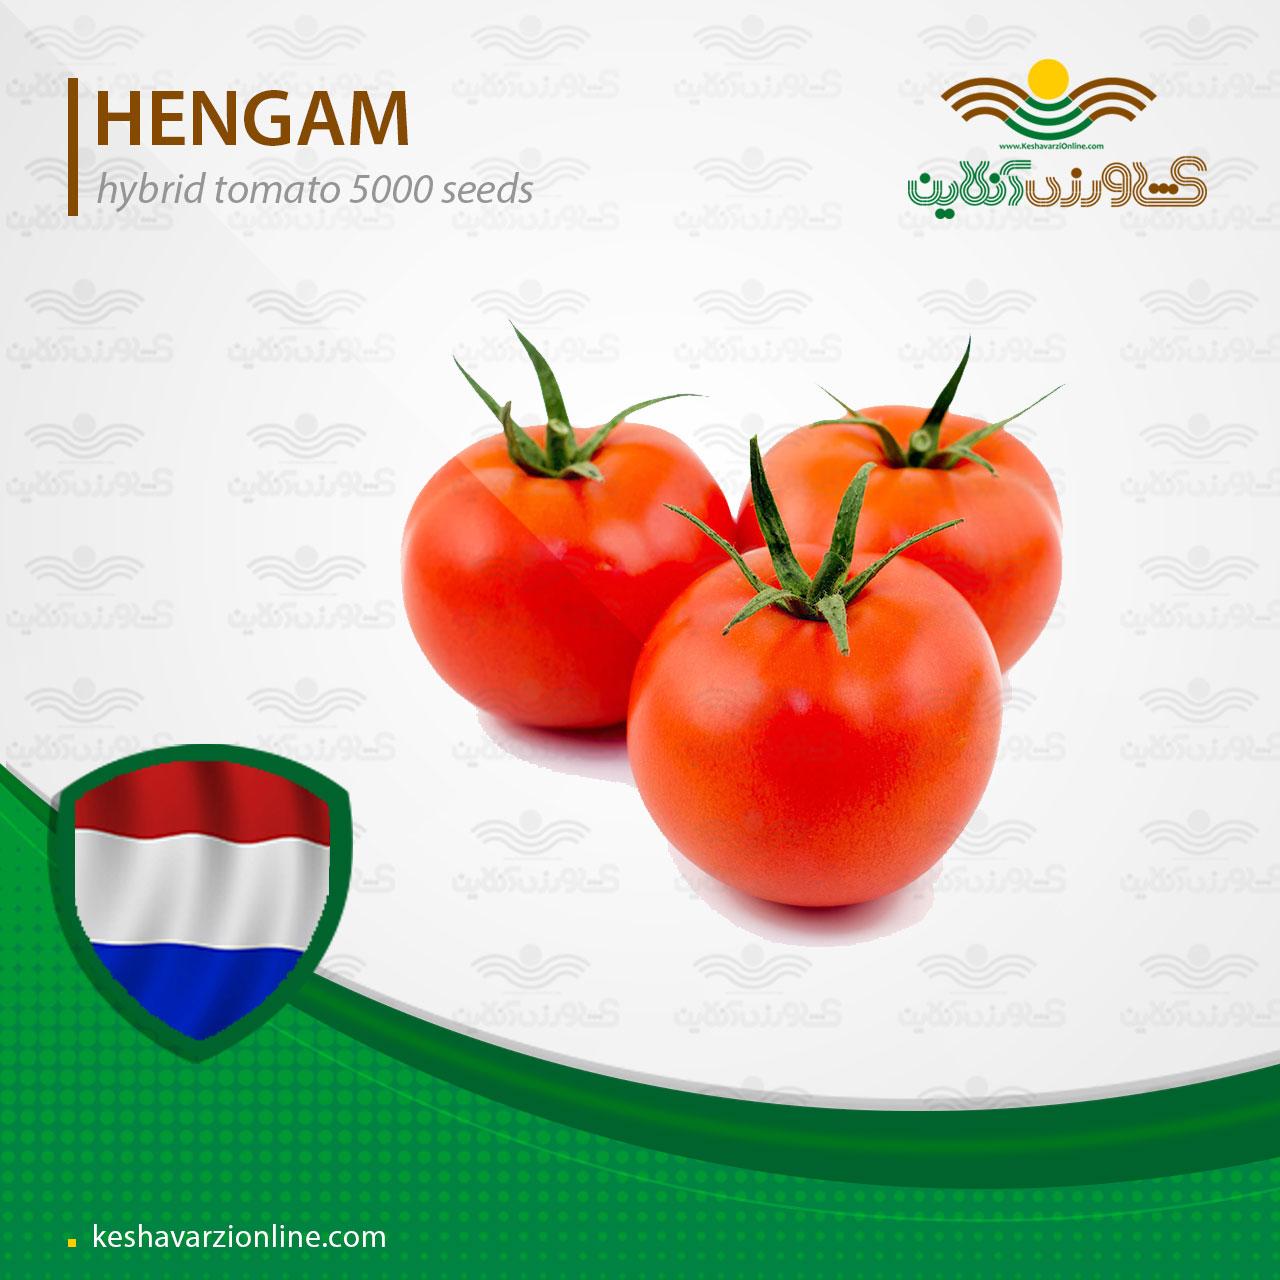 بذر گوجه فرنگی هنگام